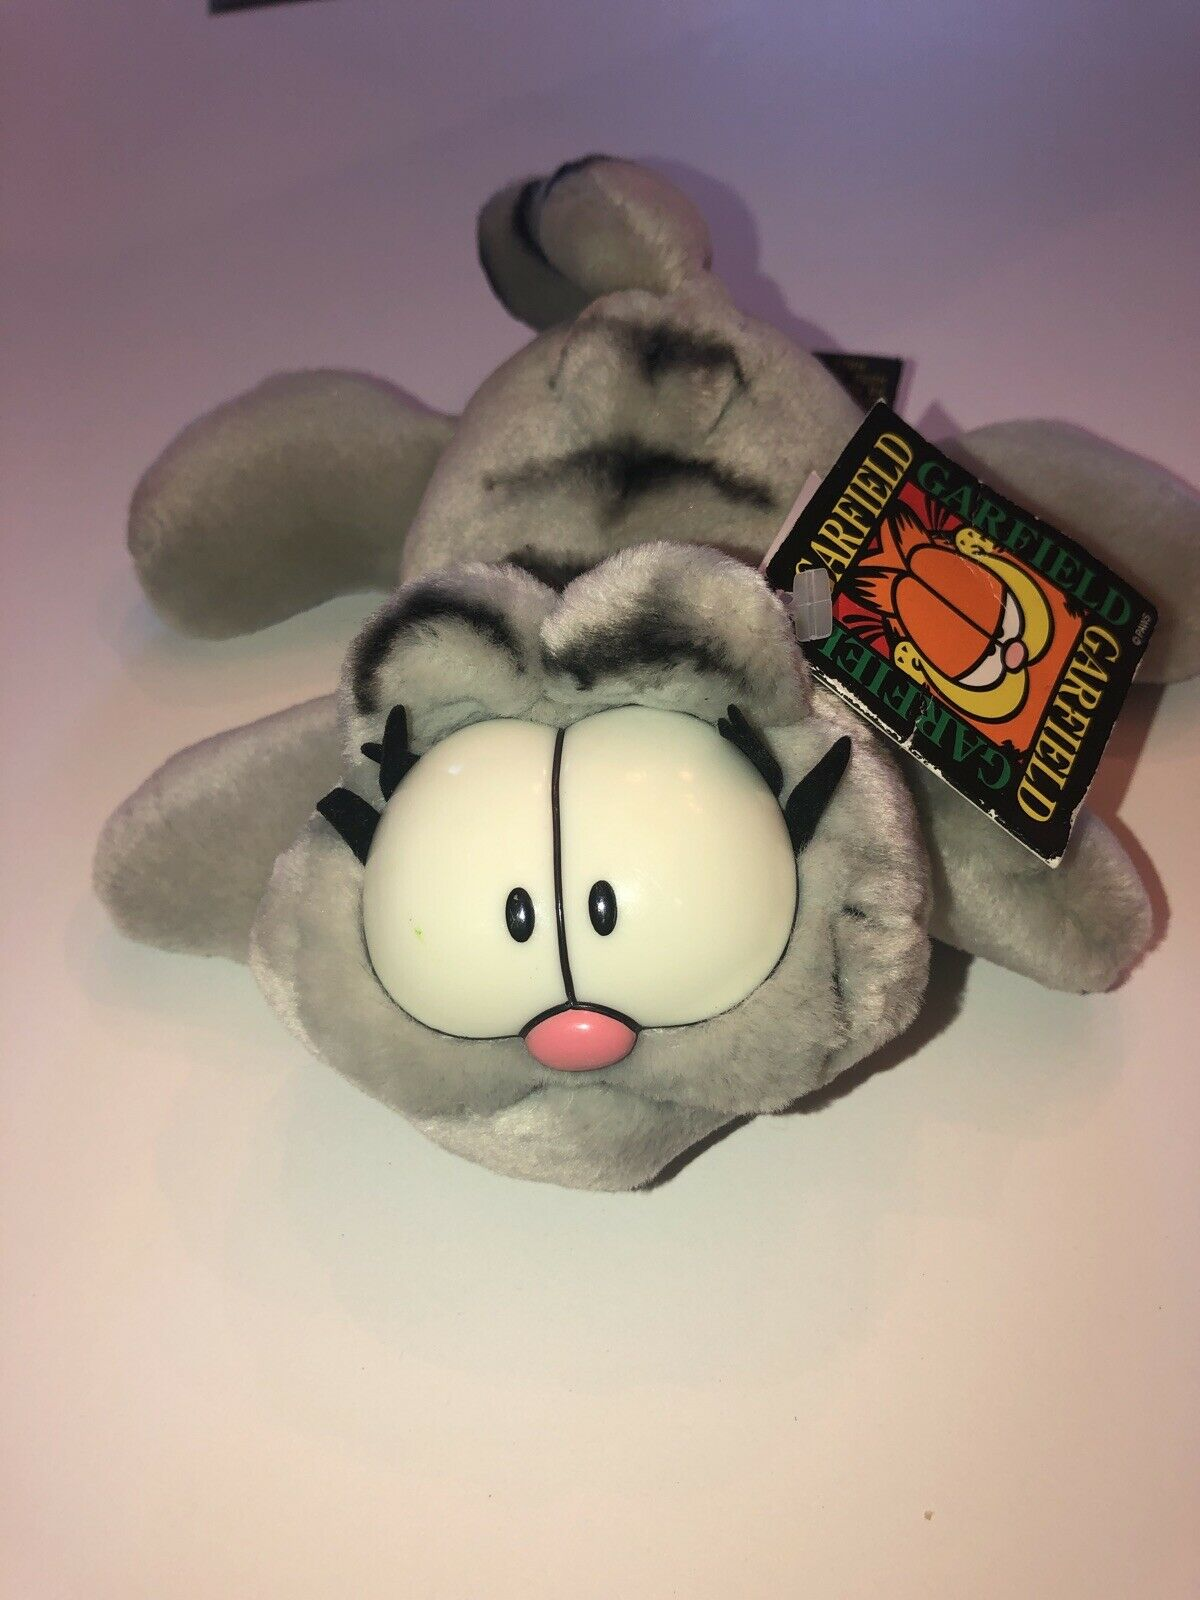 Garfield S Nemesis Nermal 6 Plush By Fine Toy Co Ltd W Tag For Sale Online